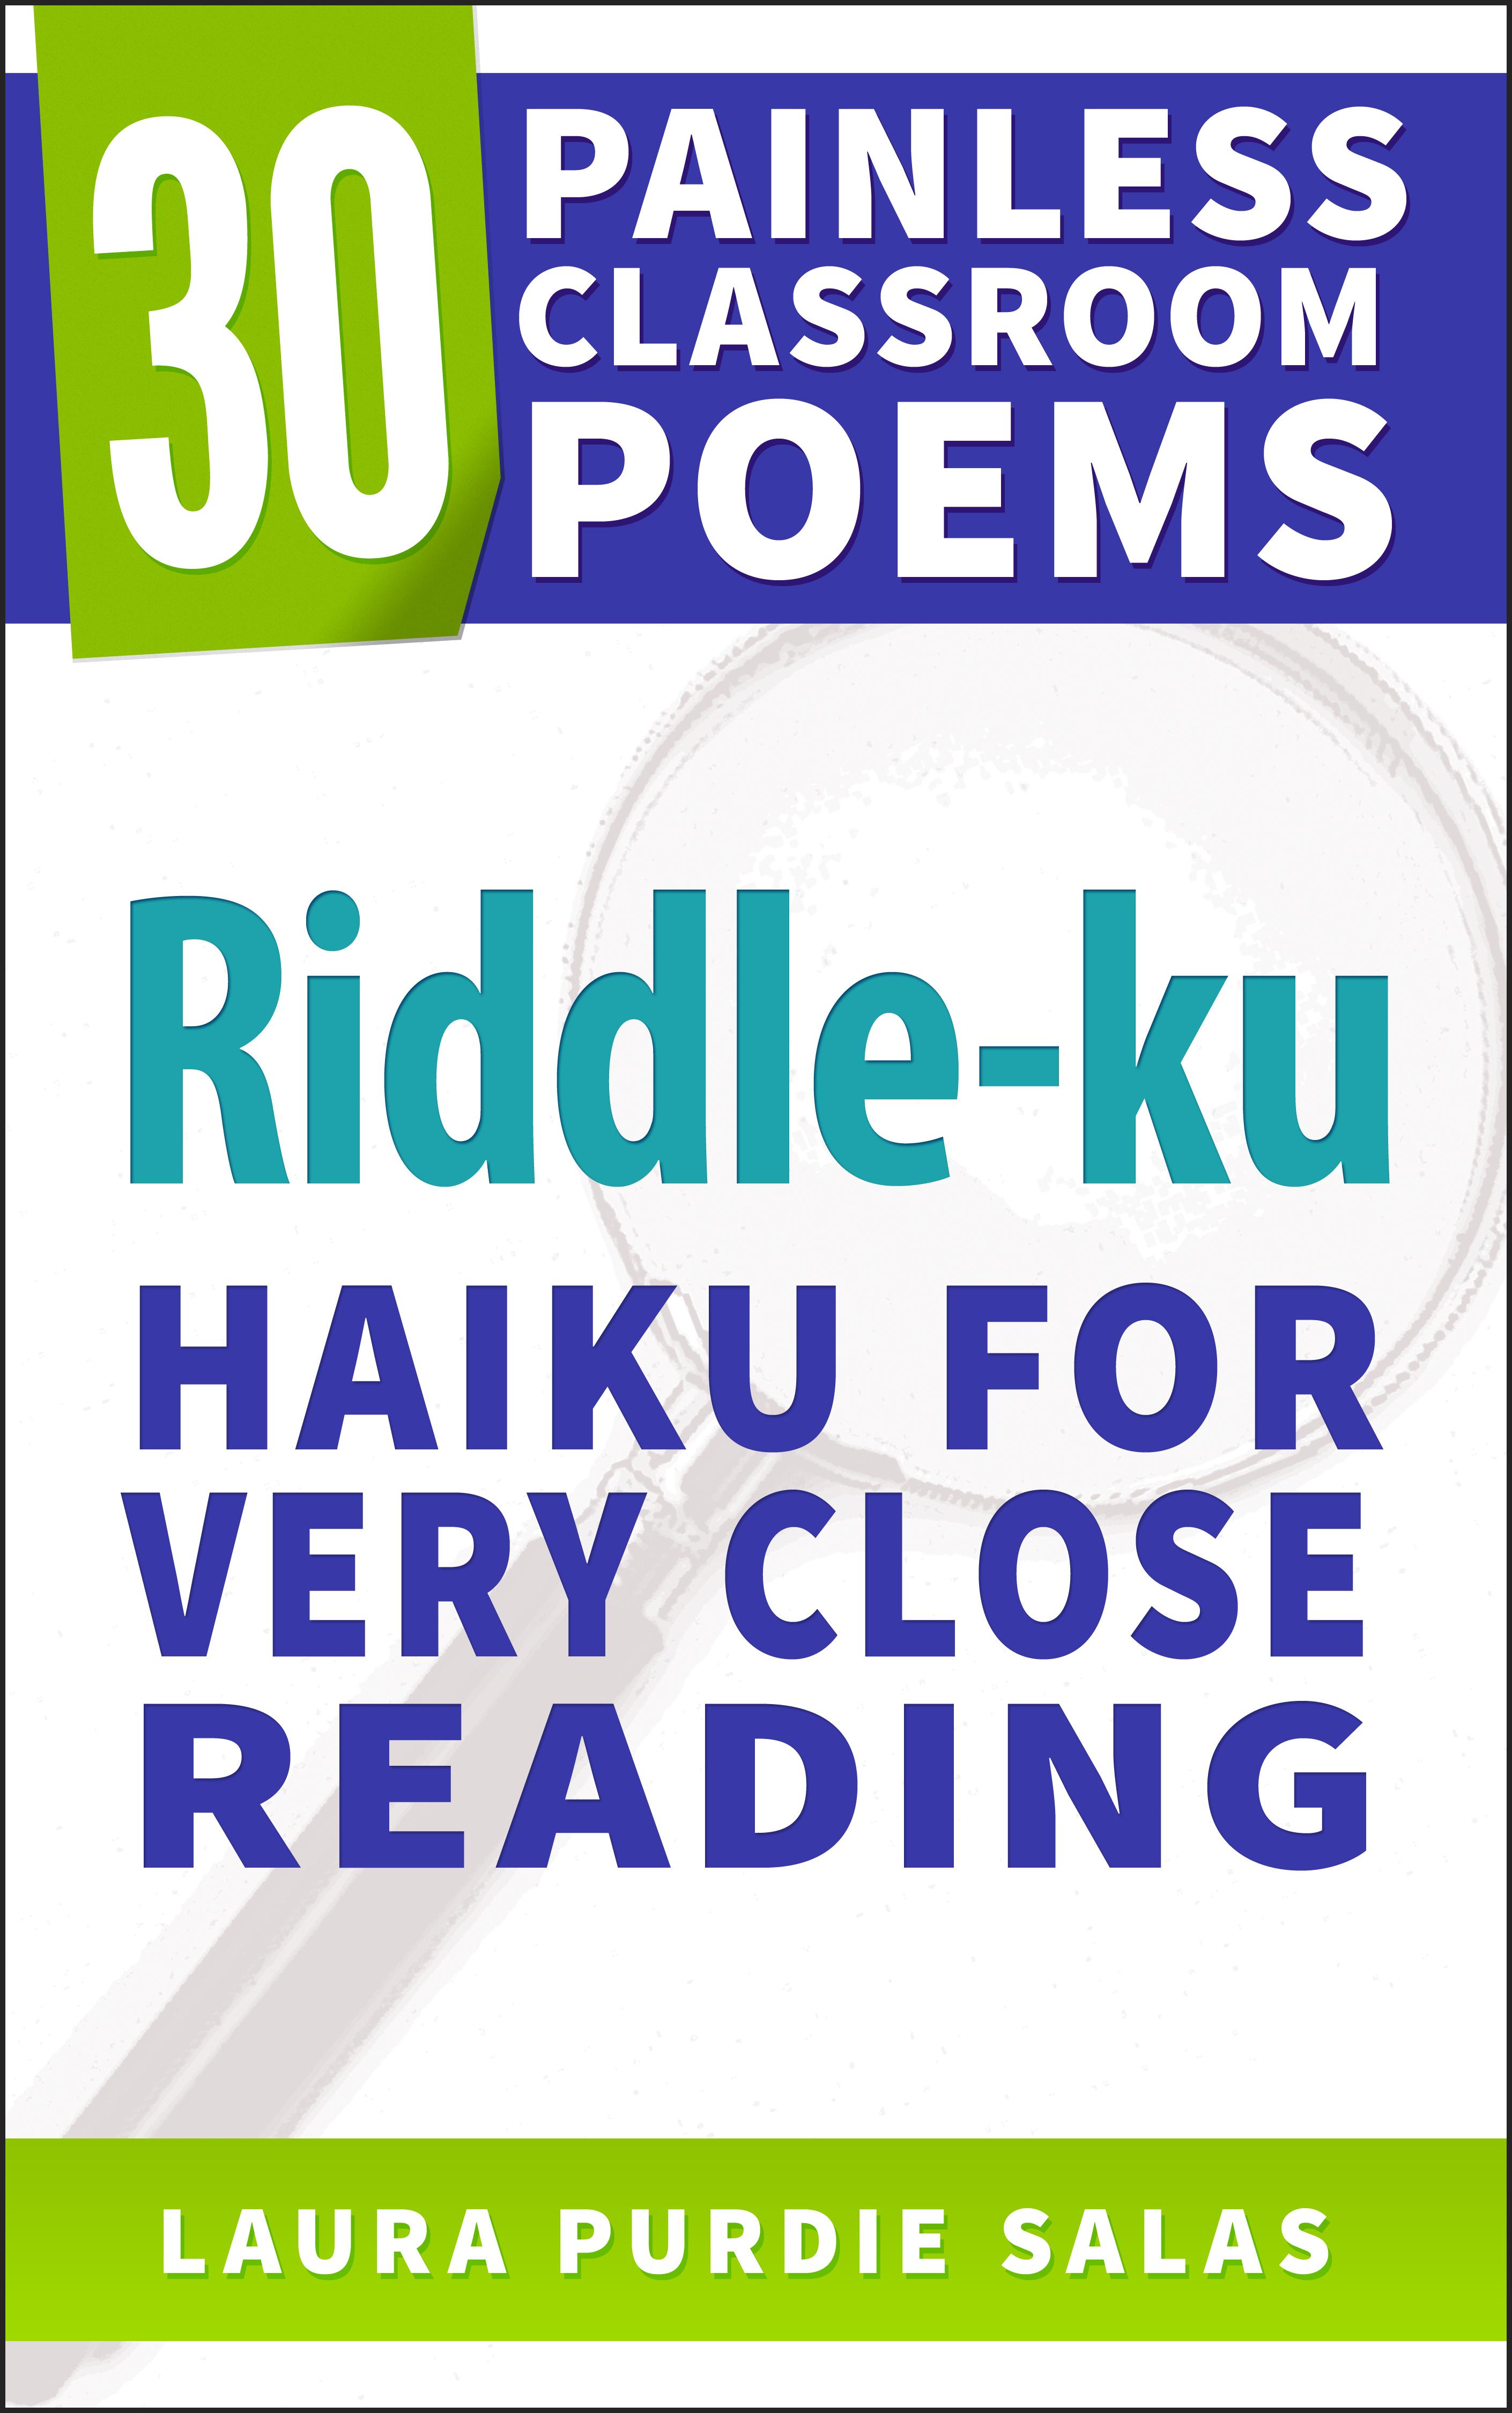 Riddle-ku: Haiku for Very Close Reading (30 Painless Classroom Poems #2)